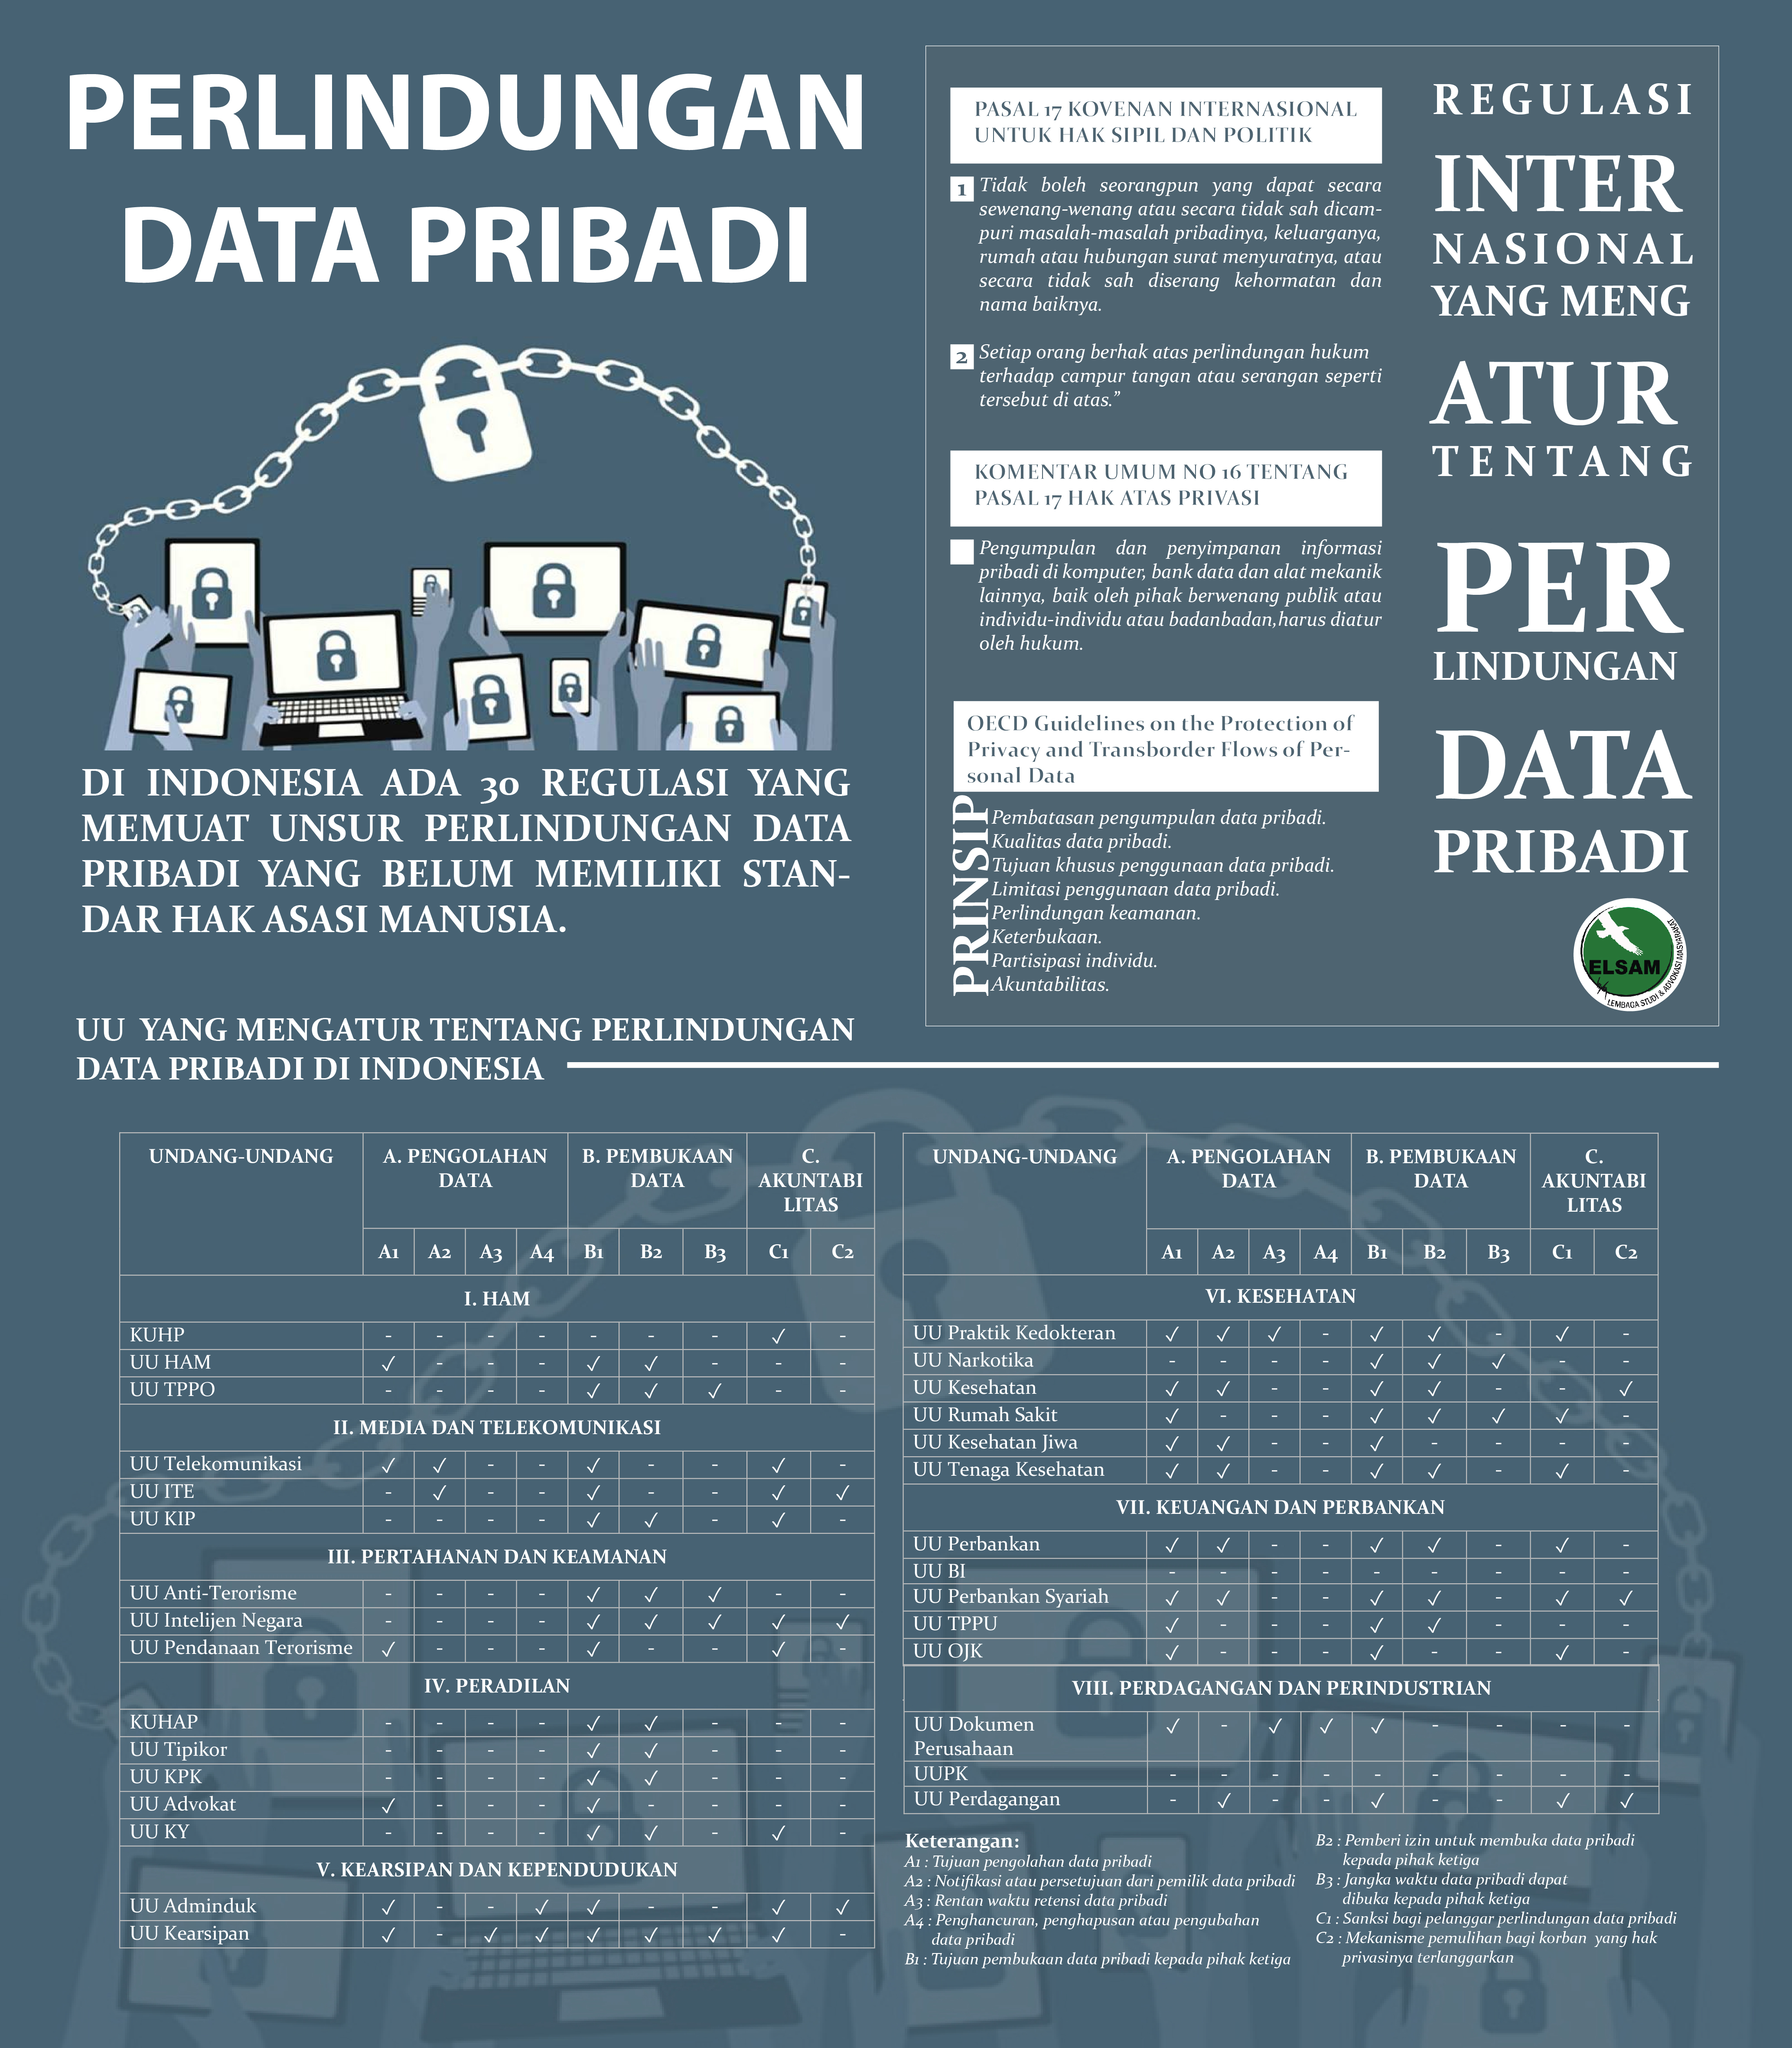 PERLINDUNGAN DATA PRIBADI-01